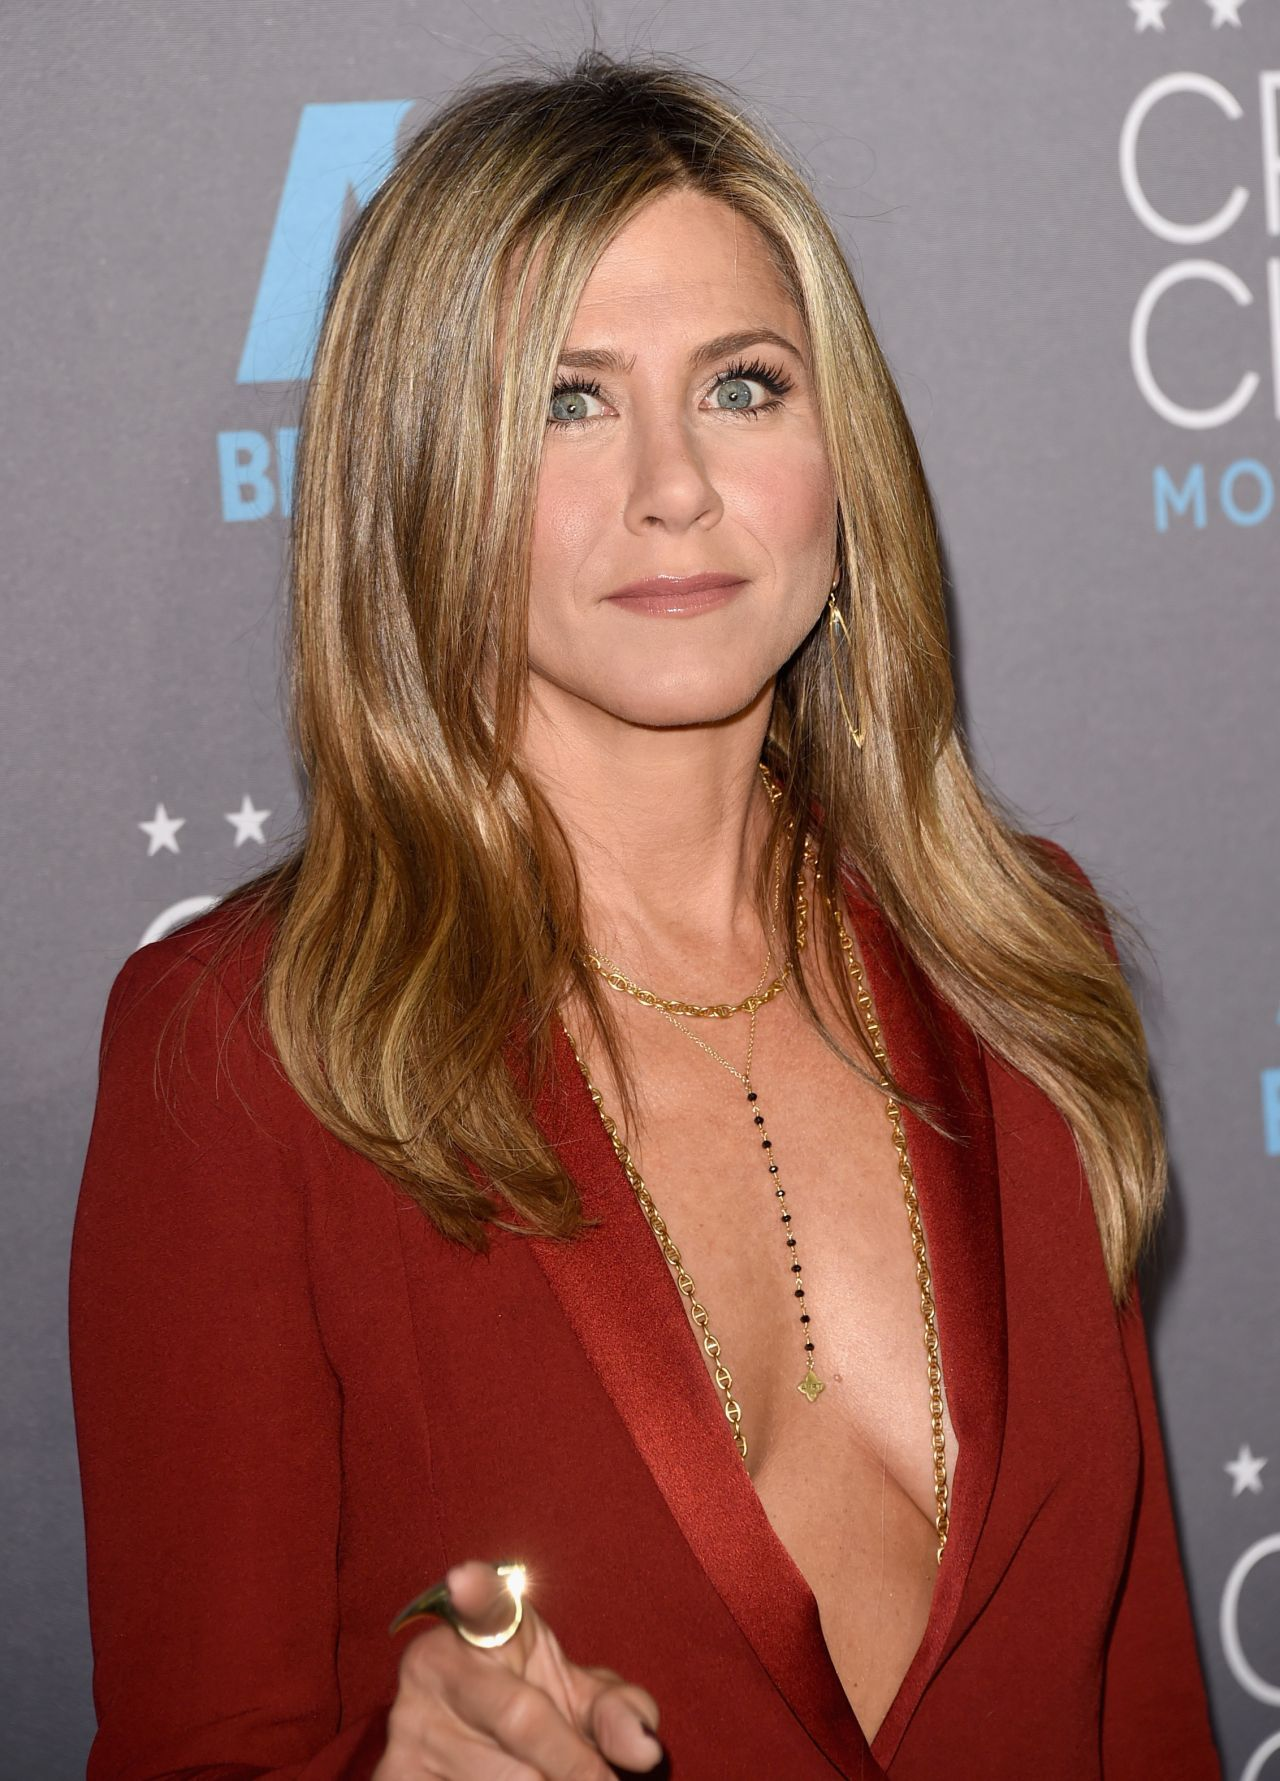 Jennifer Aniston was born in Sherman Oaks, California, to actors John  Aniston and Nancy